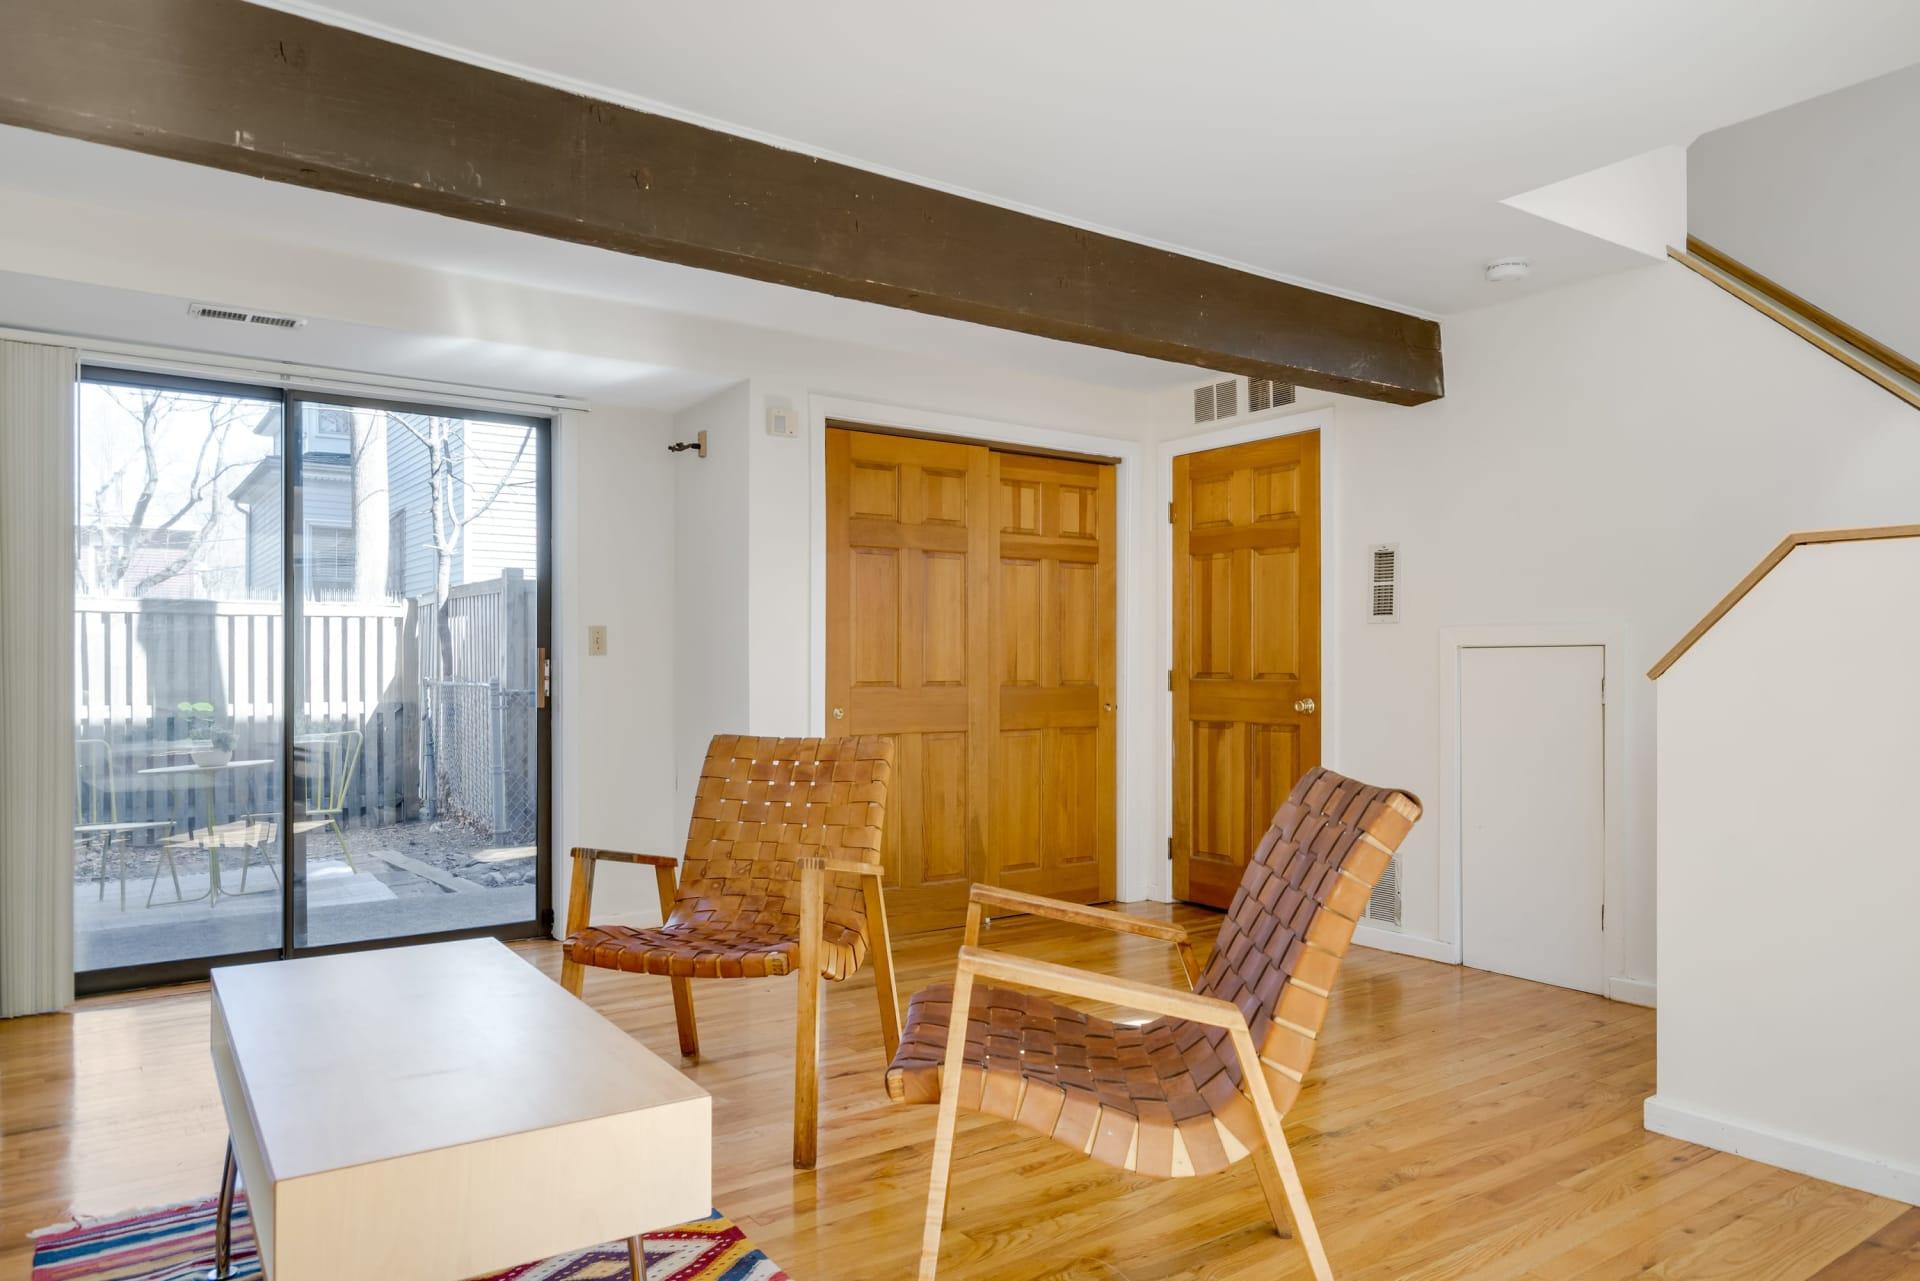 Cambridge Single-Family Townhouse for Rent photo